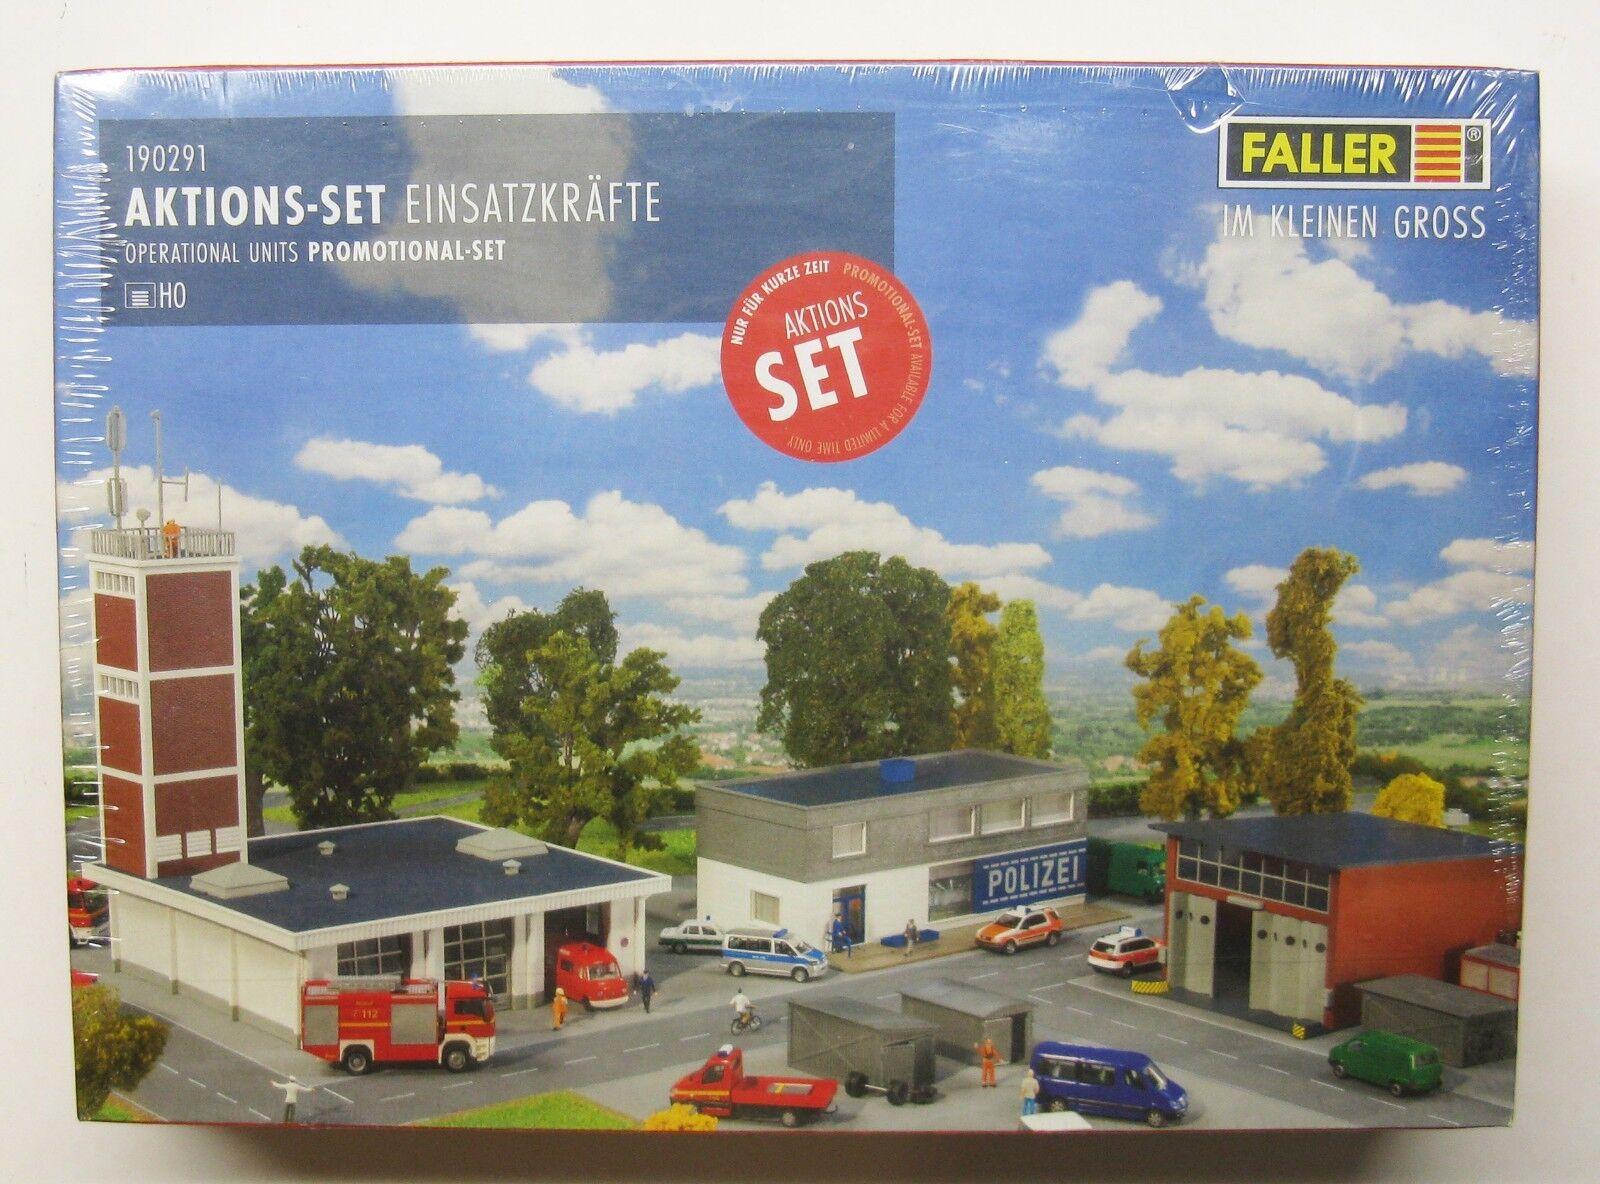 Faller H0 Model Kit 190291 OPERATIONAL UNITS PROMOTIONAL SET 1:87 POLIZEI